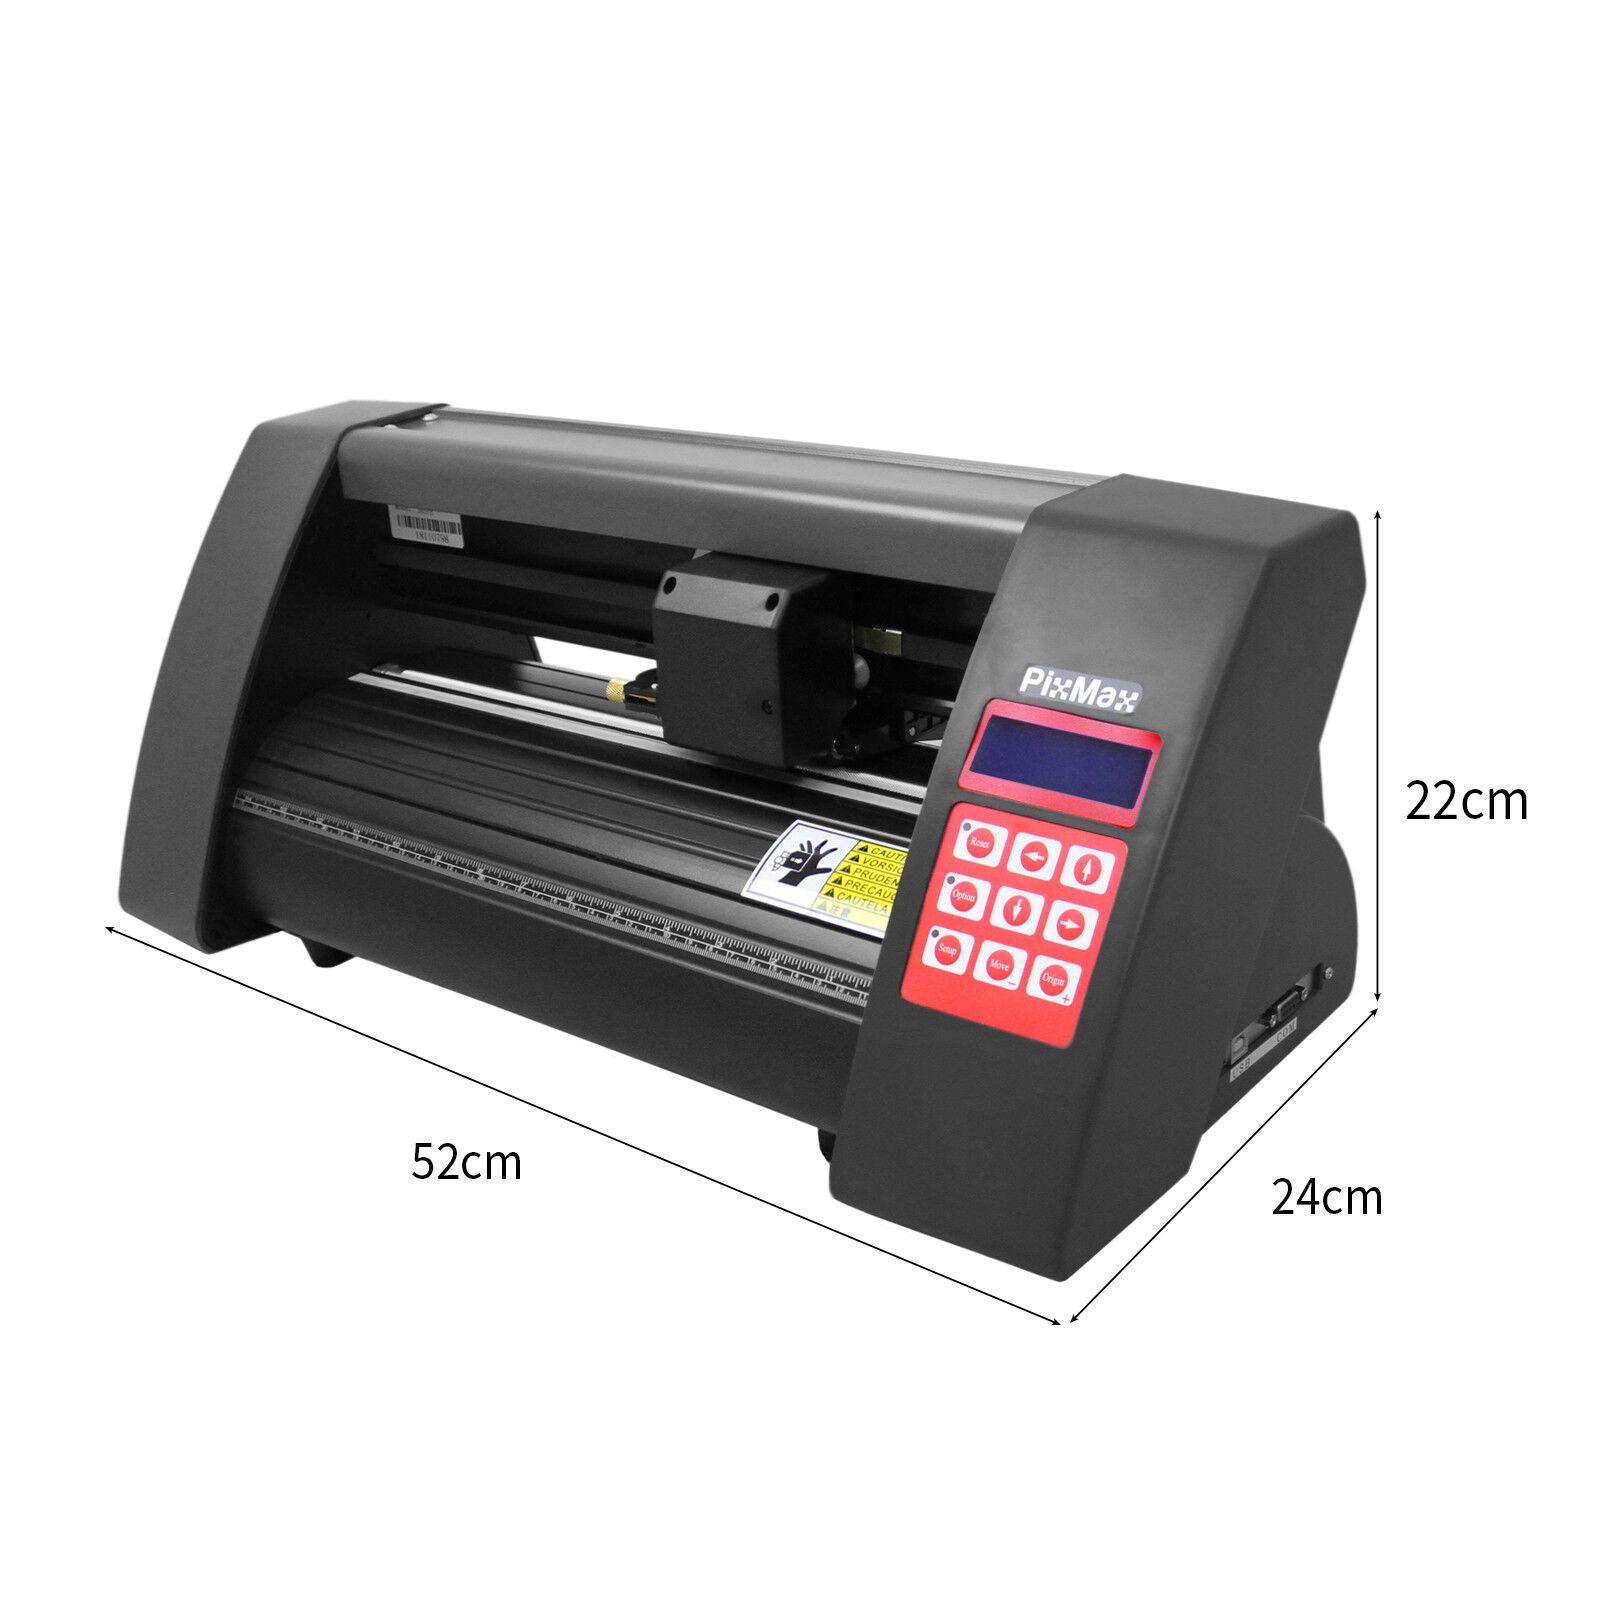 Vinyl cutter plotter 20 inch business sign sticker cutting making flexi starter for sale online ebay